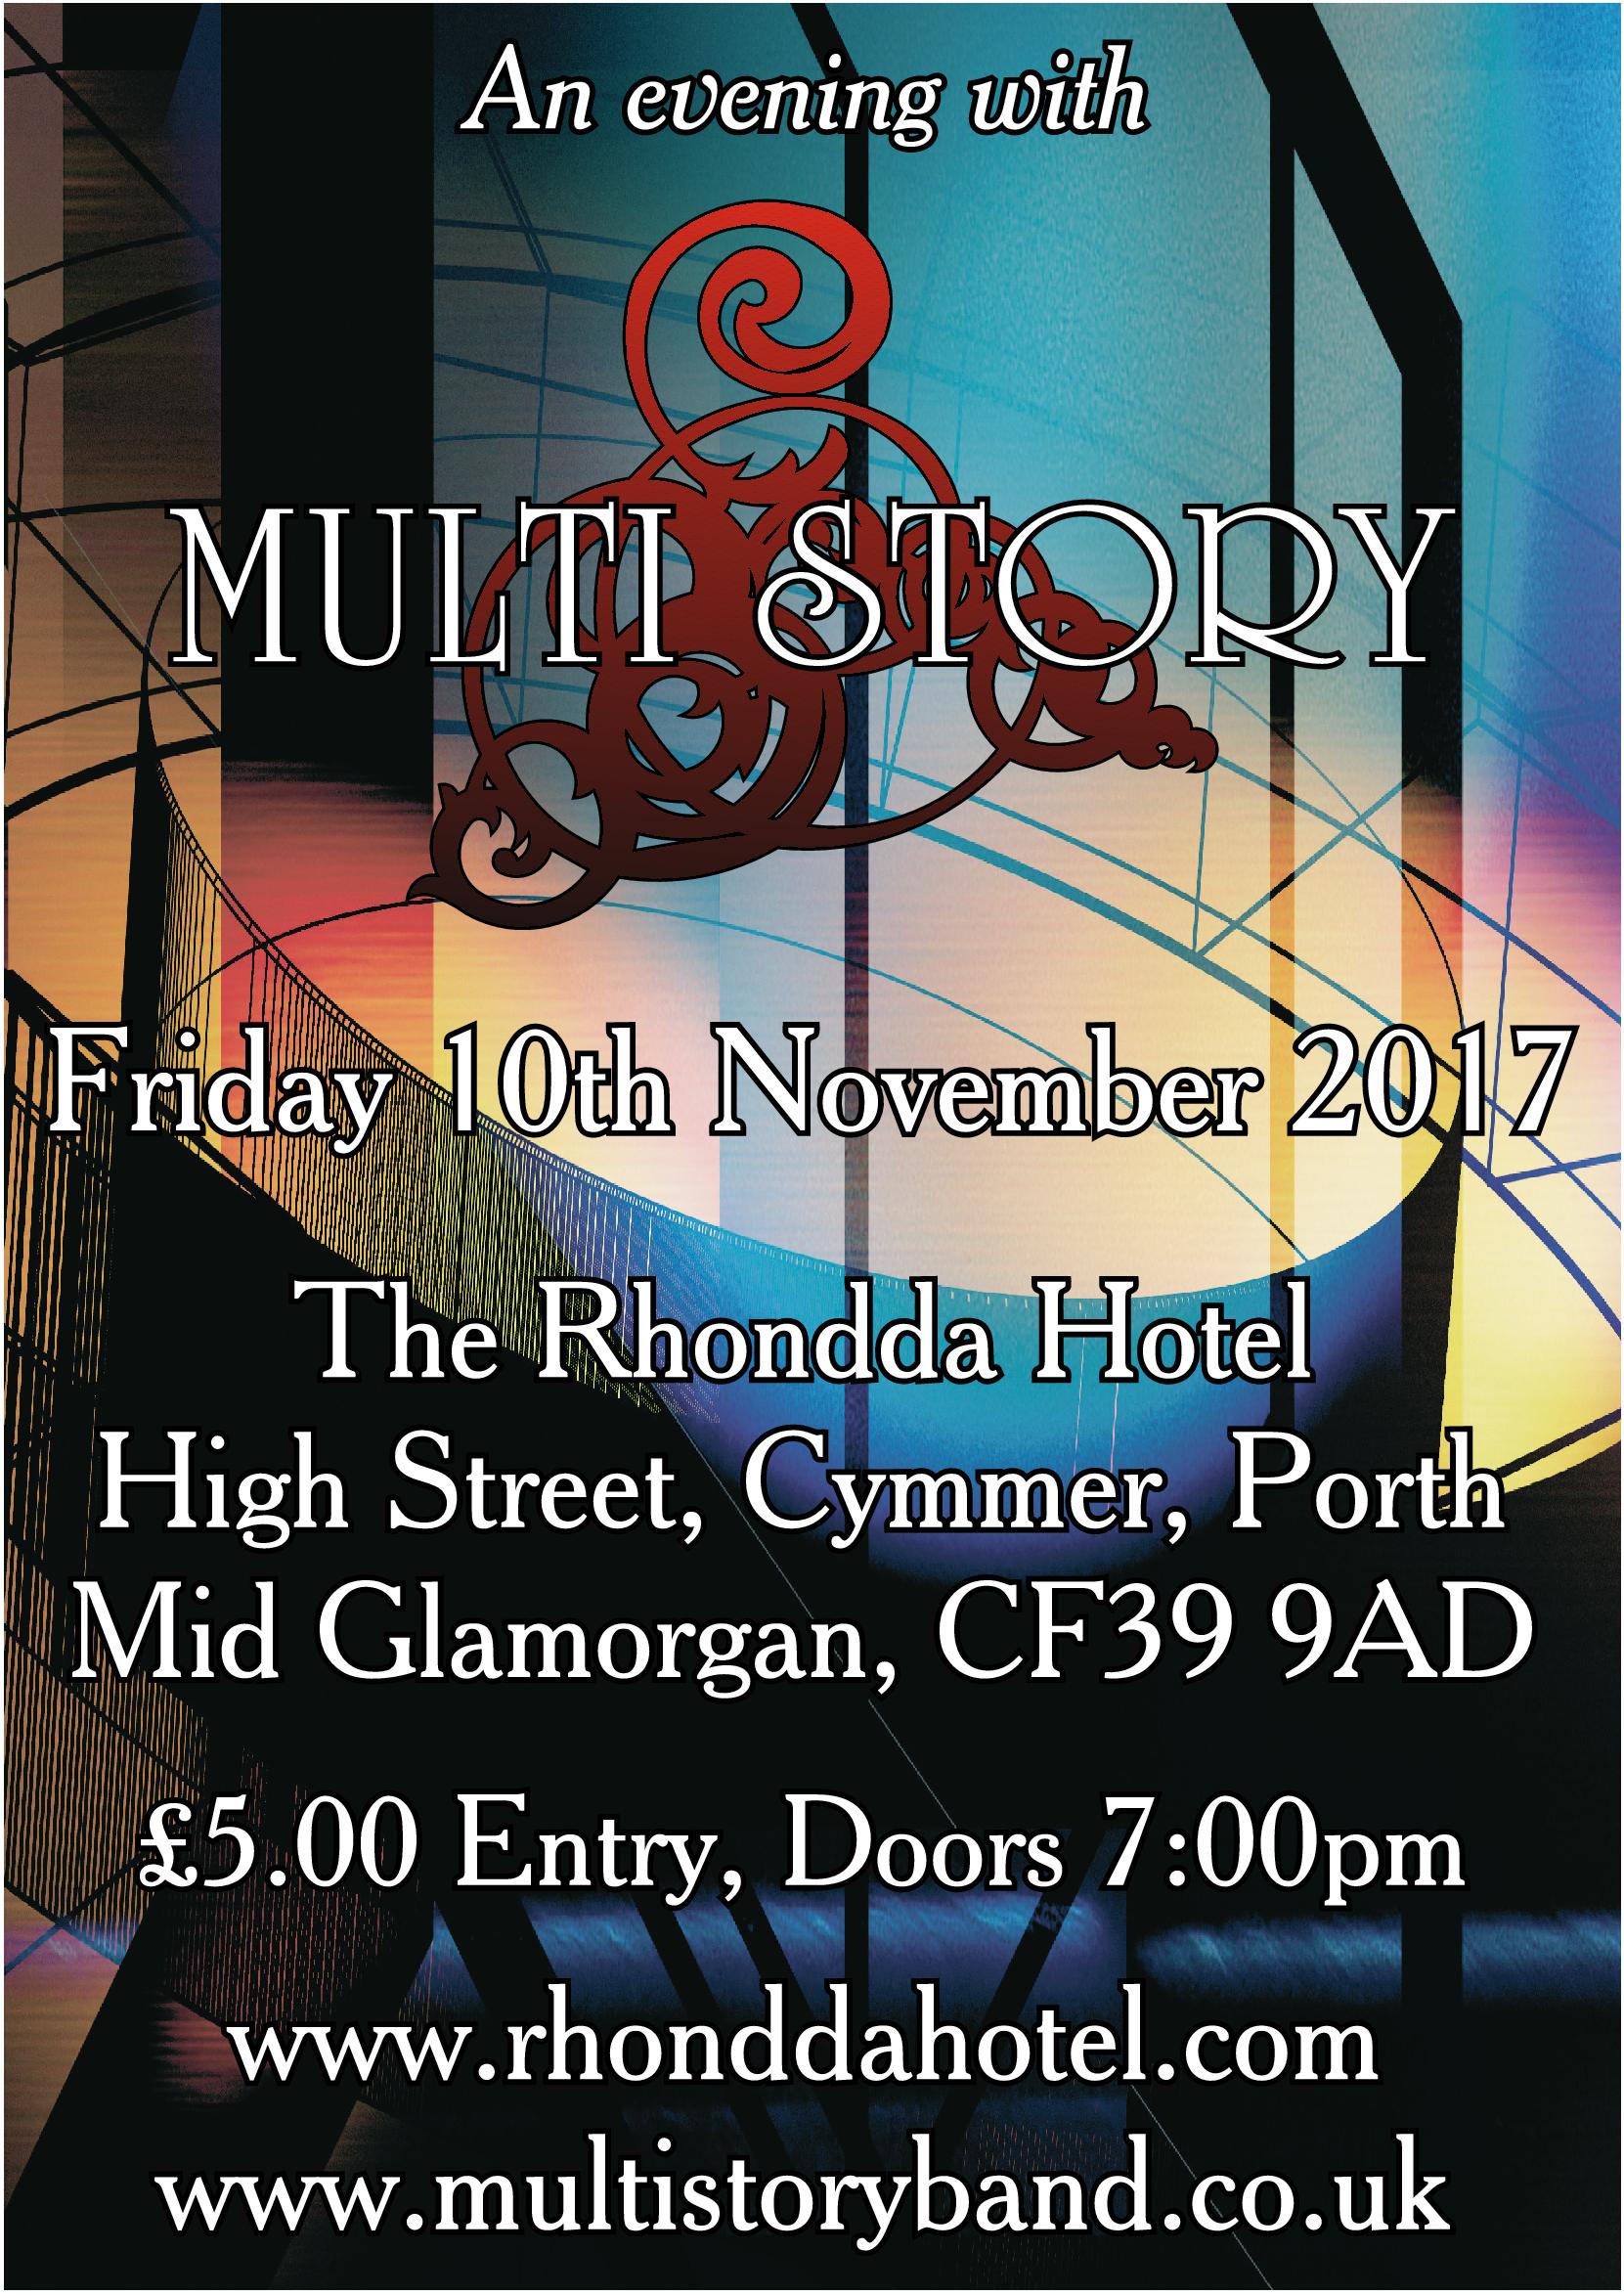 Multi_Story_Rhondda_Hotel_Gig_Poster_10-10-17